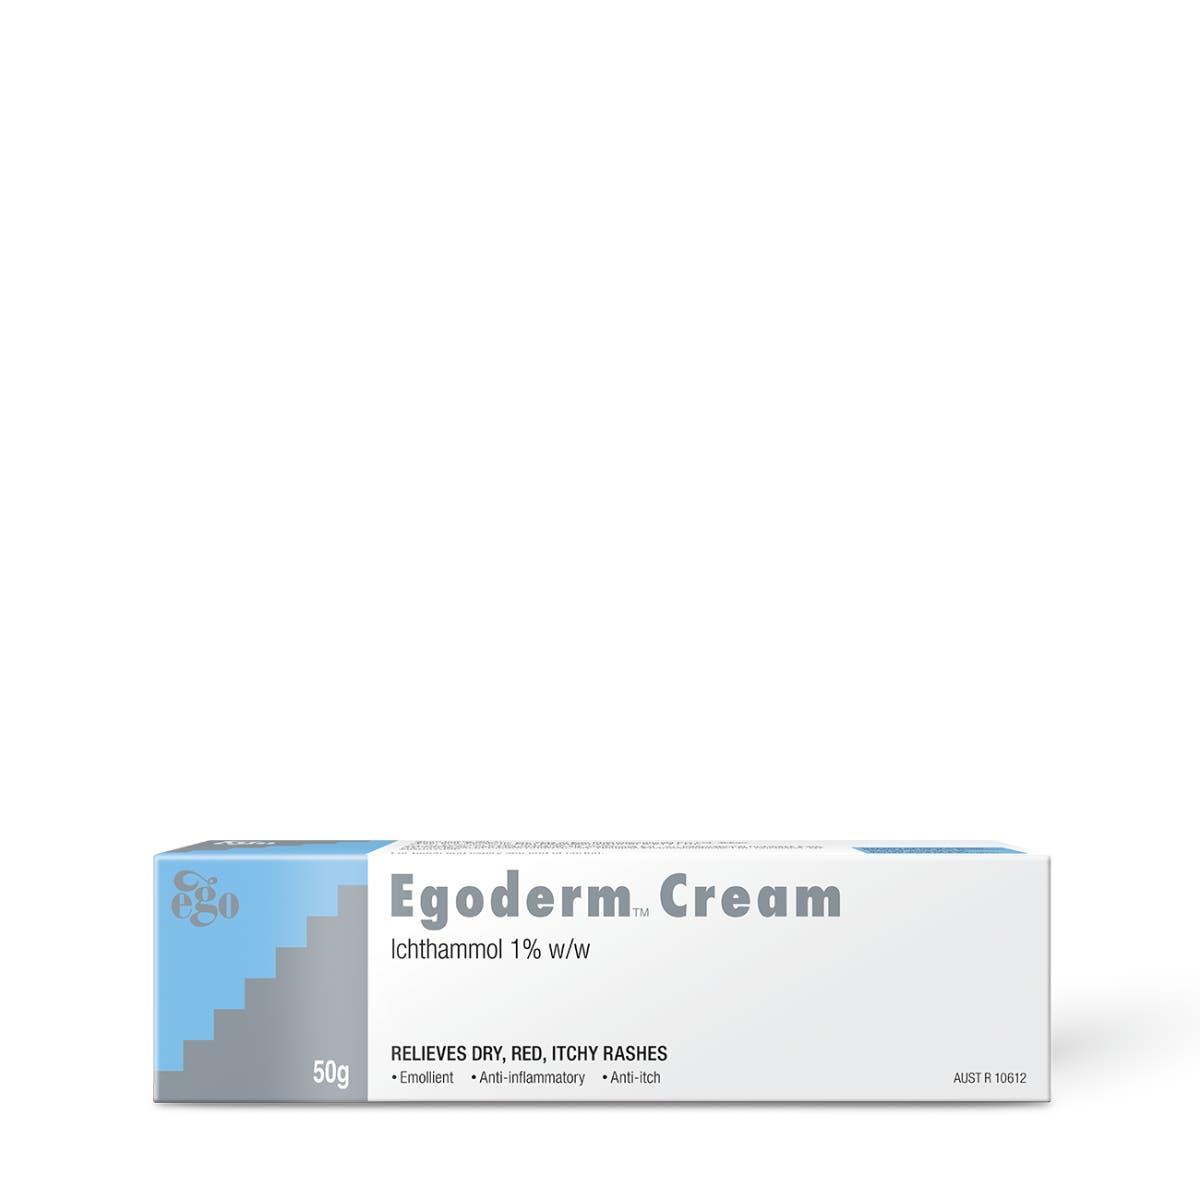 Egoderm Cream